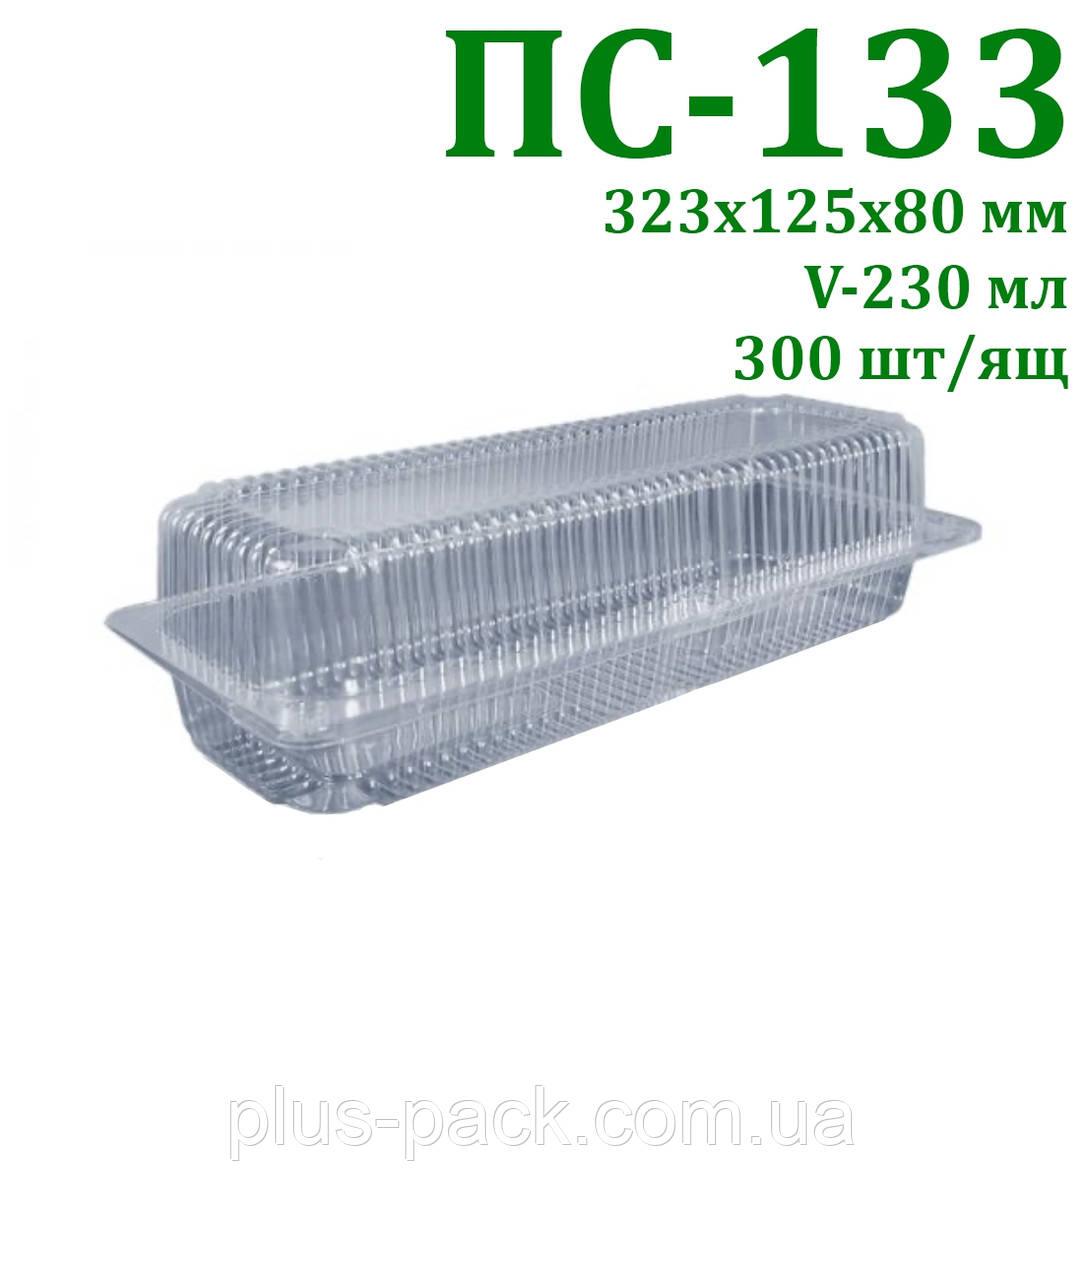 Блистерная одноразовая упаковка ПС-133 (2300мл)